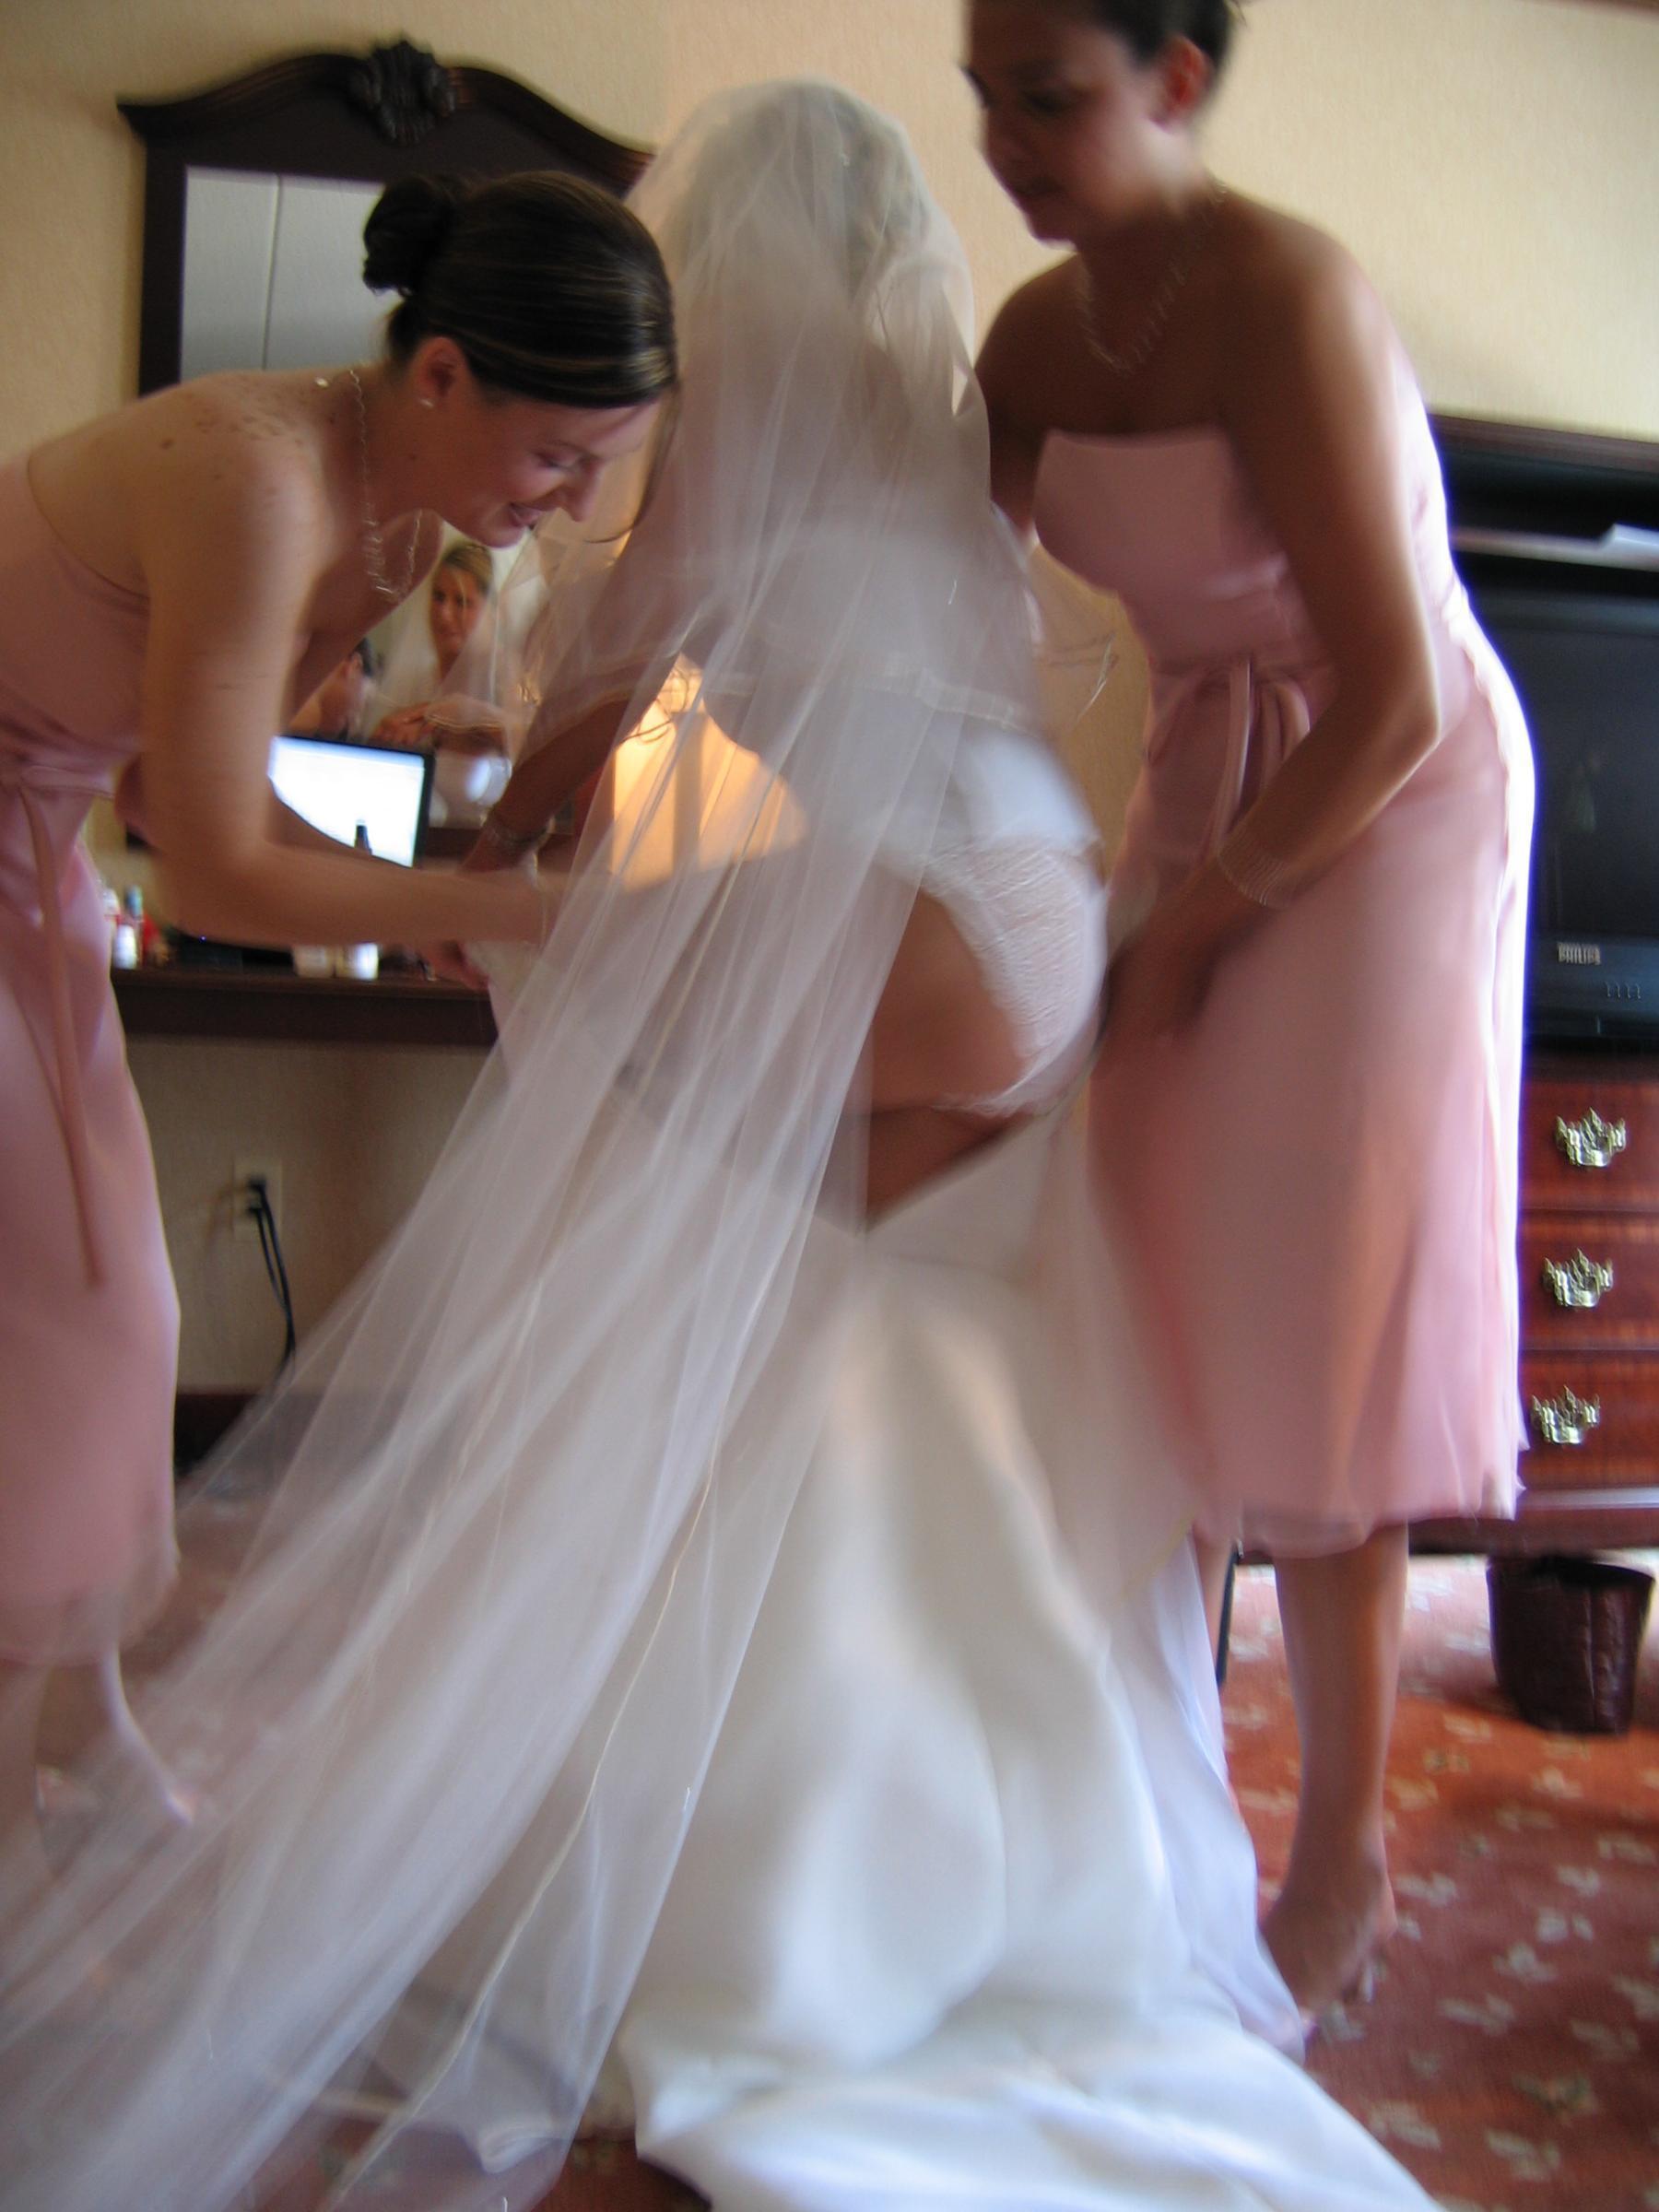 Real nude amateur women sites